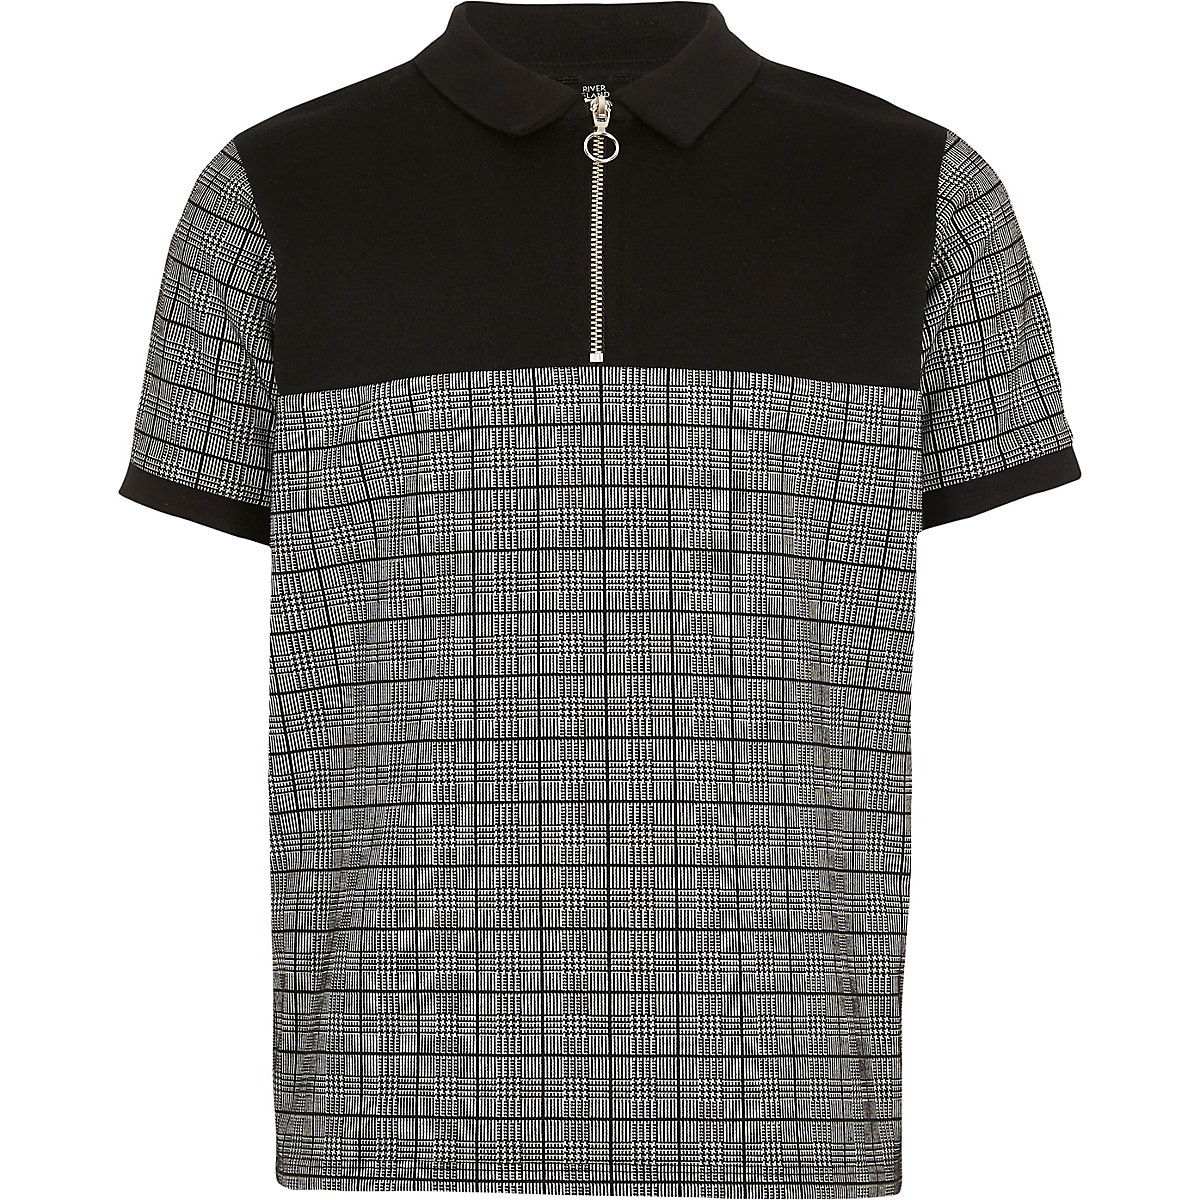 29d628c6b Boys black check zip neck polo shirt - Polo Shirts - boys